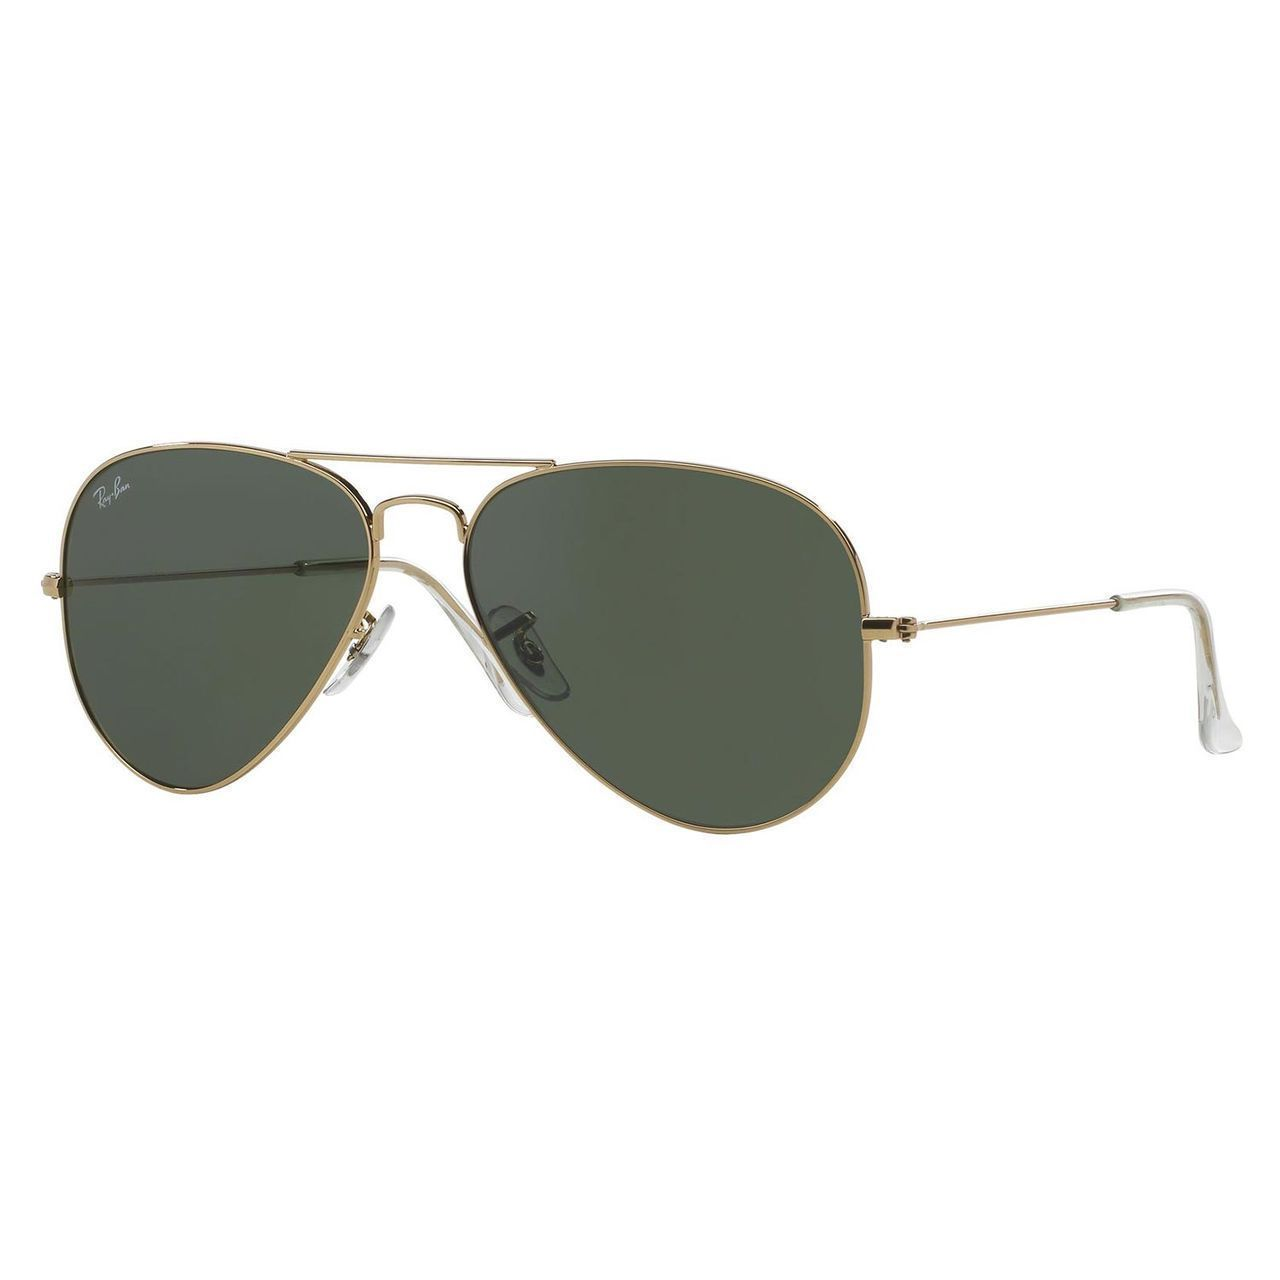 Shop Ray-Ban Aviator RB3025 Unisex Gold Frame Green Lens Sunglasses ... d4736509ce